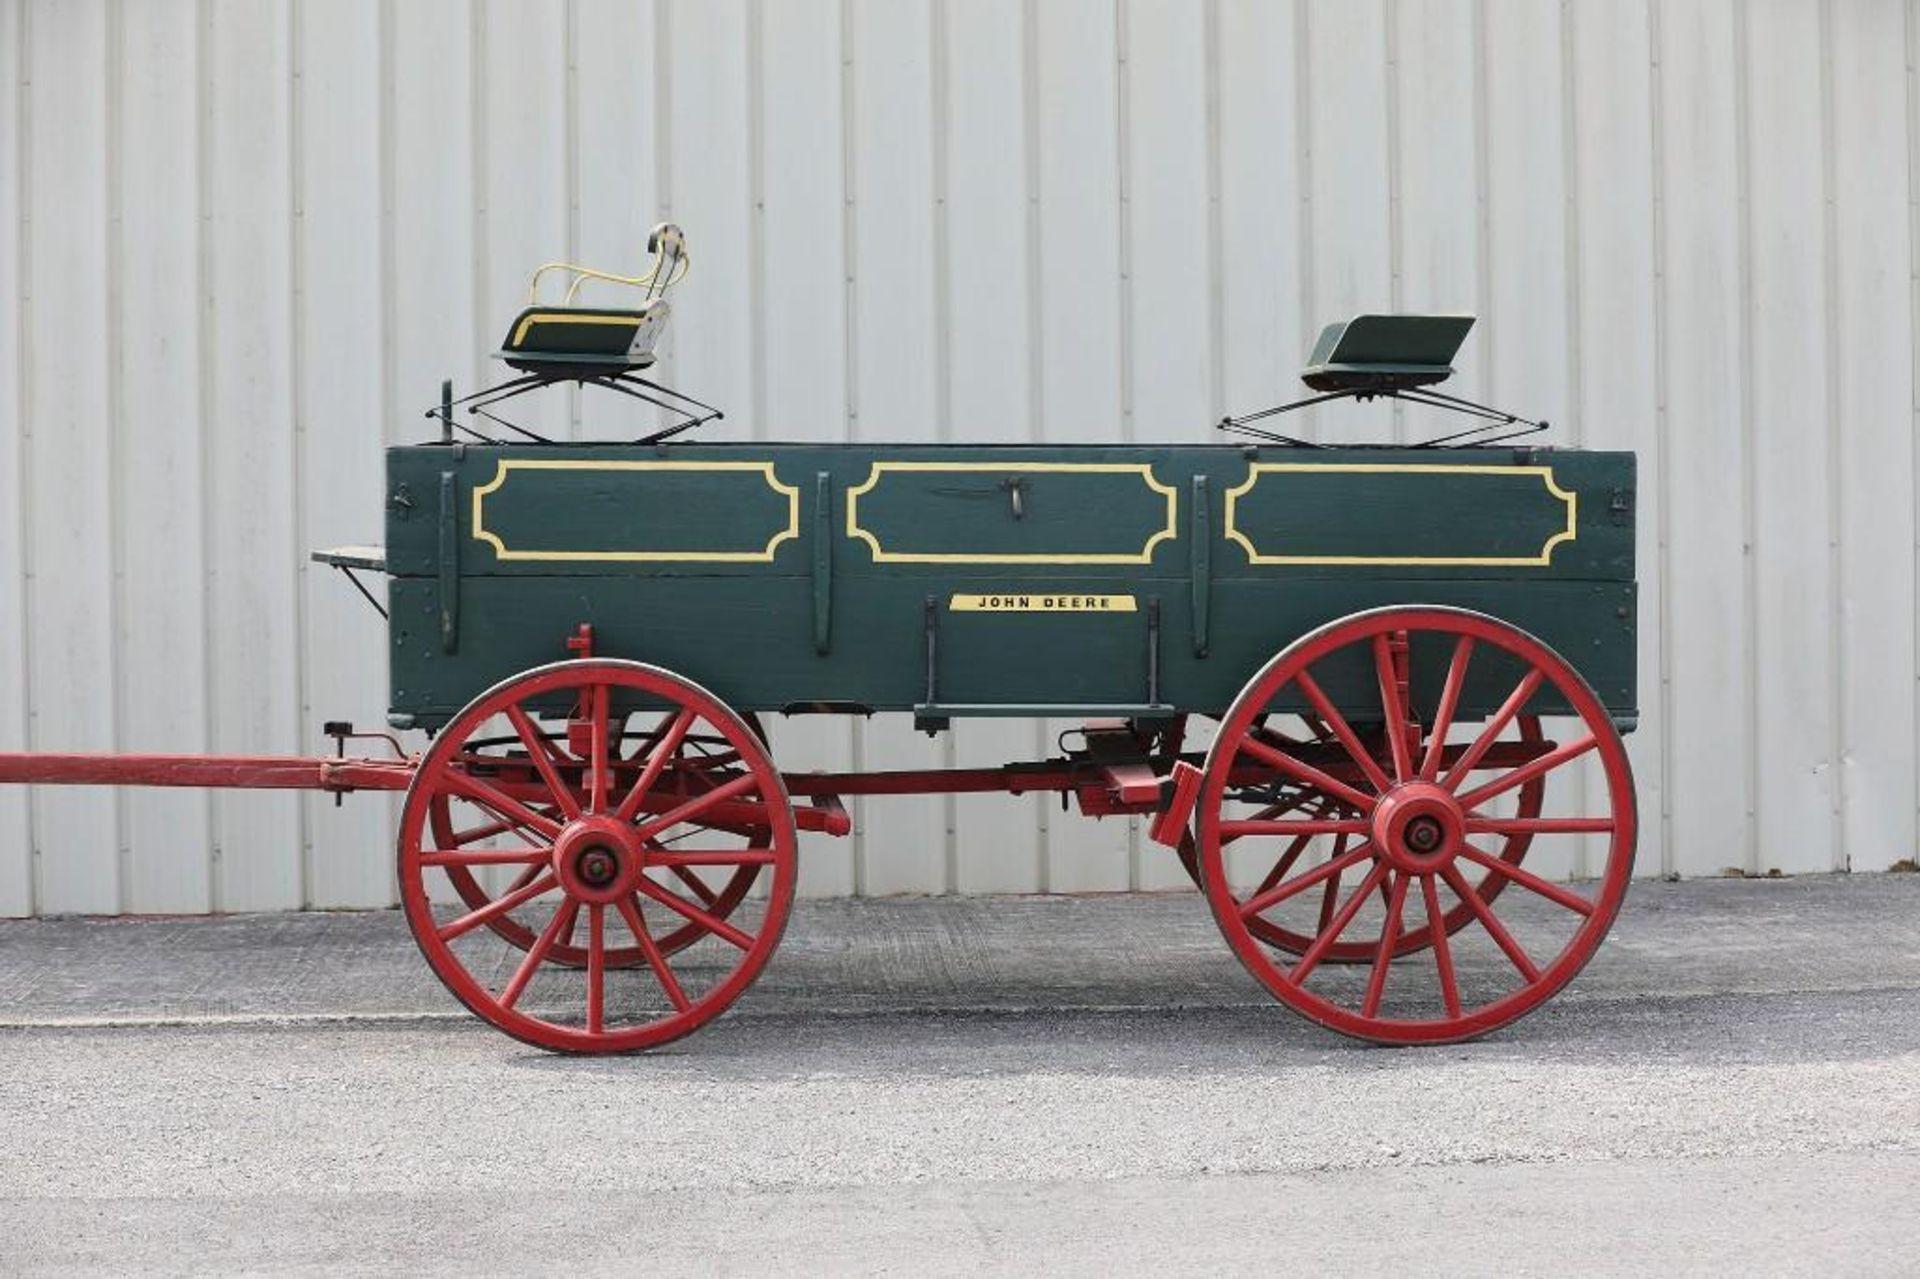 JOHN DEERE Box Bed Farm Wagon, (2) Seats will sell separate